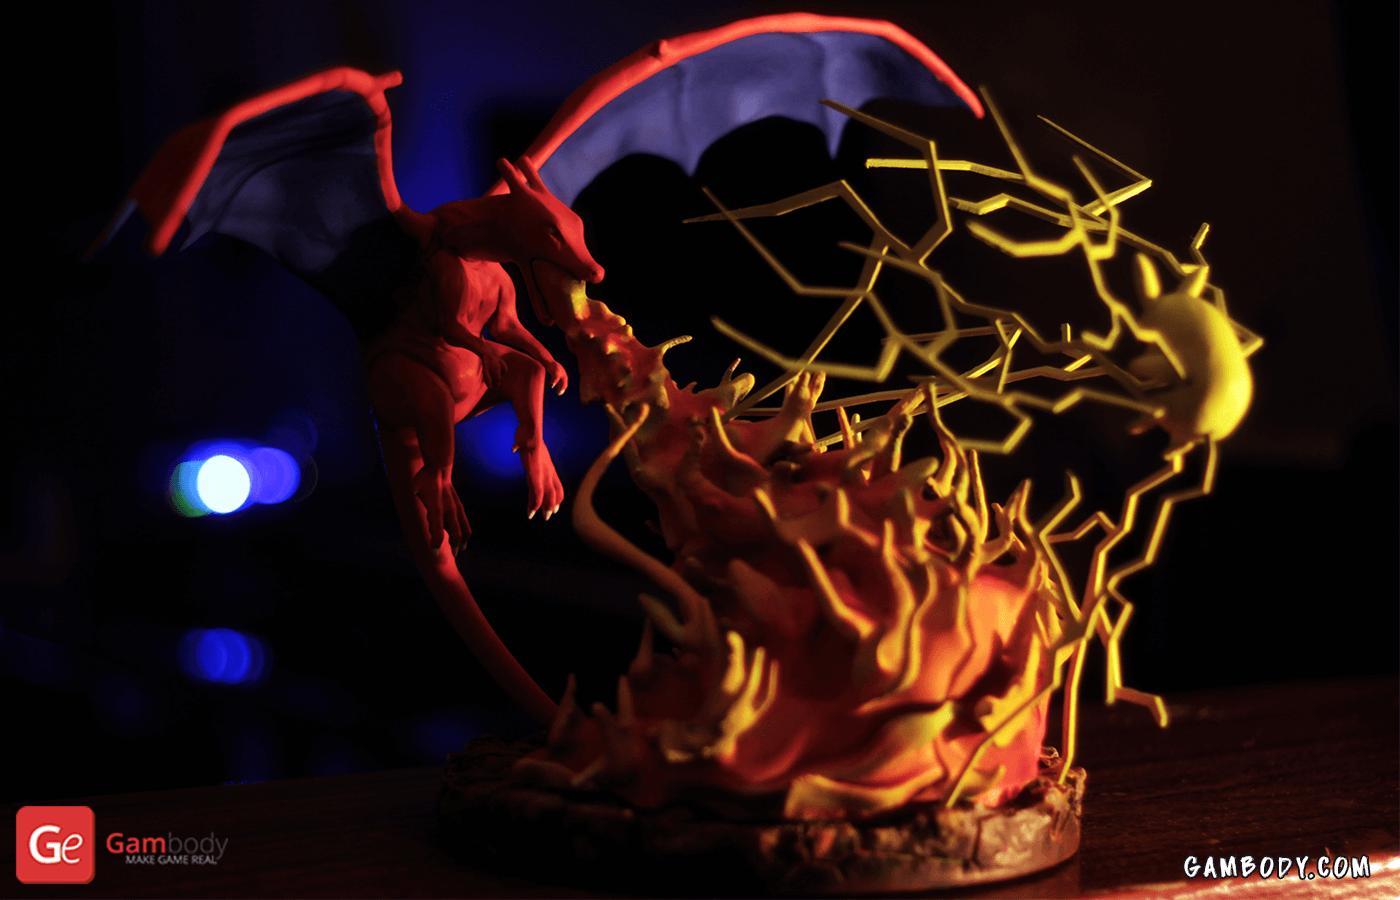 Pokemon, Charizard vs. Pikachu 3D printing Diorama